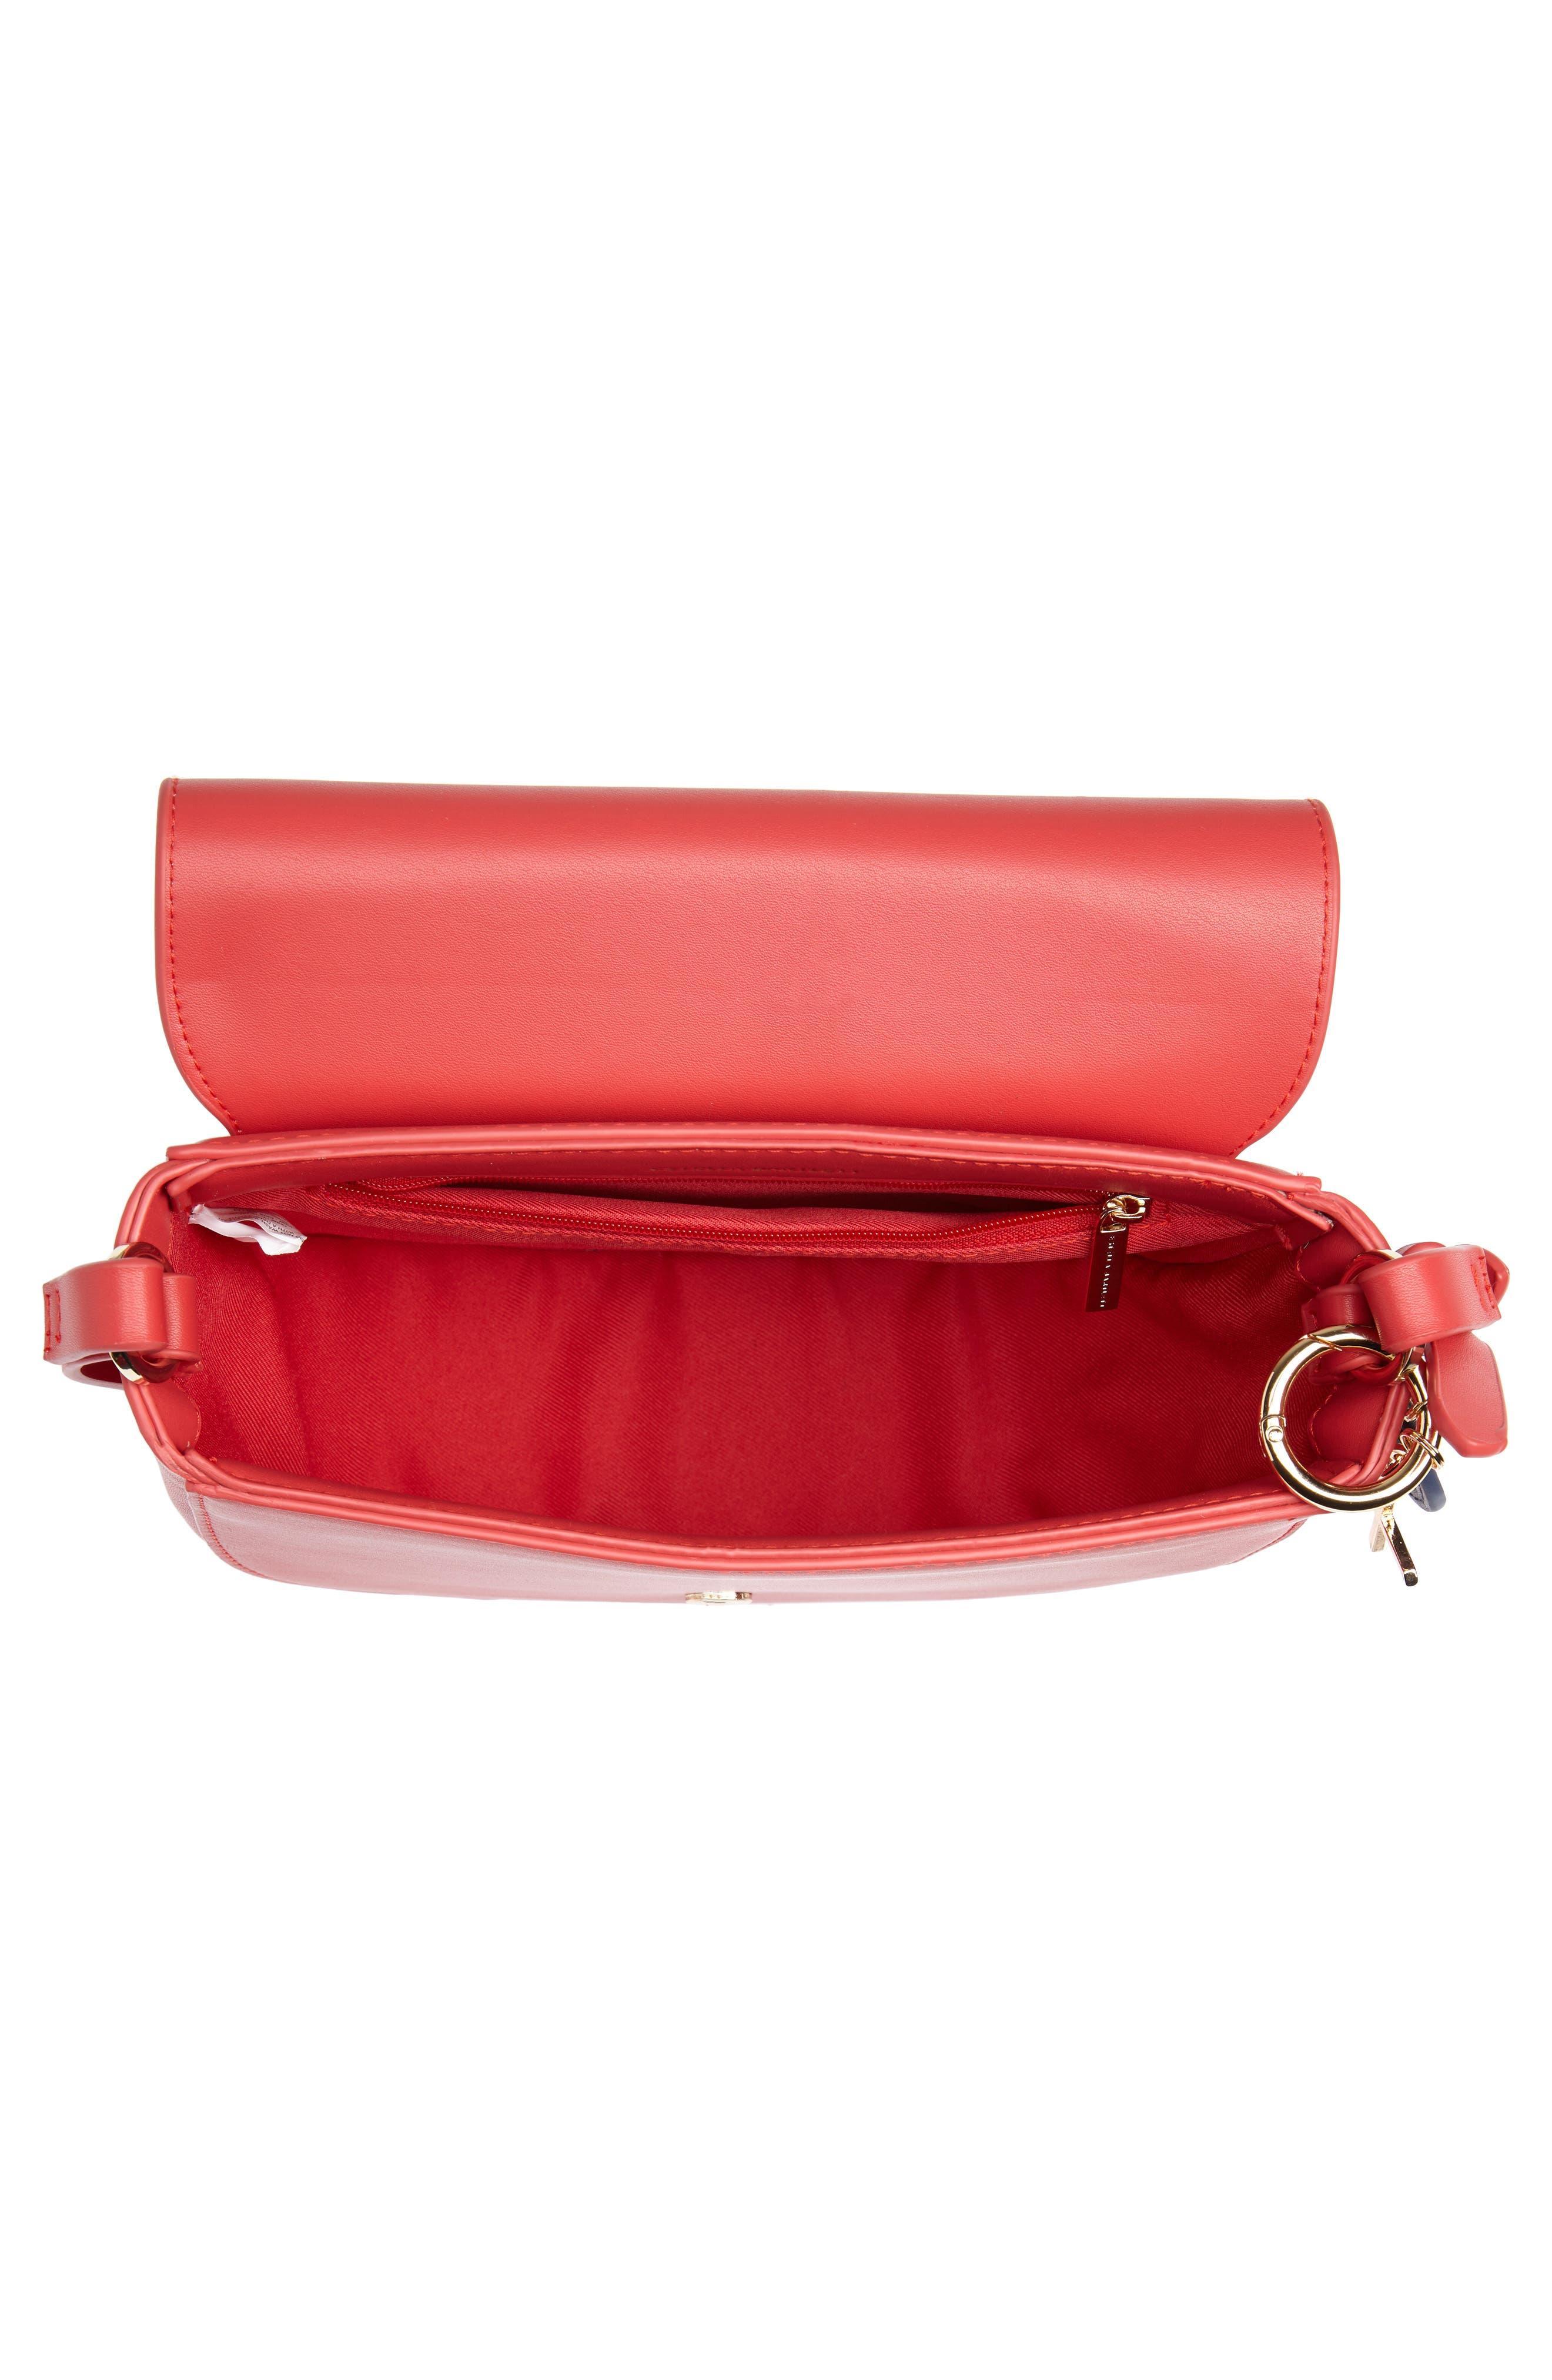 ESTELLA BARTLETT, Loman Faux Leather Saddle Bag, Alternate thumbnail 5, color, 600